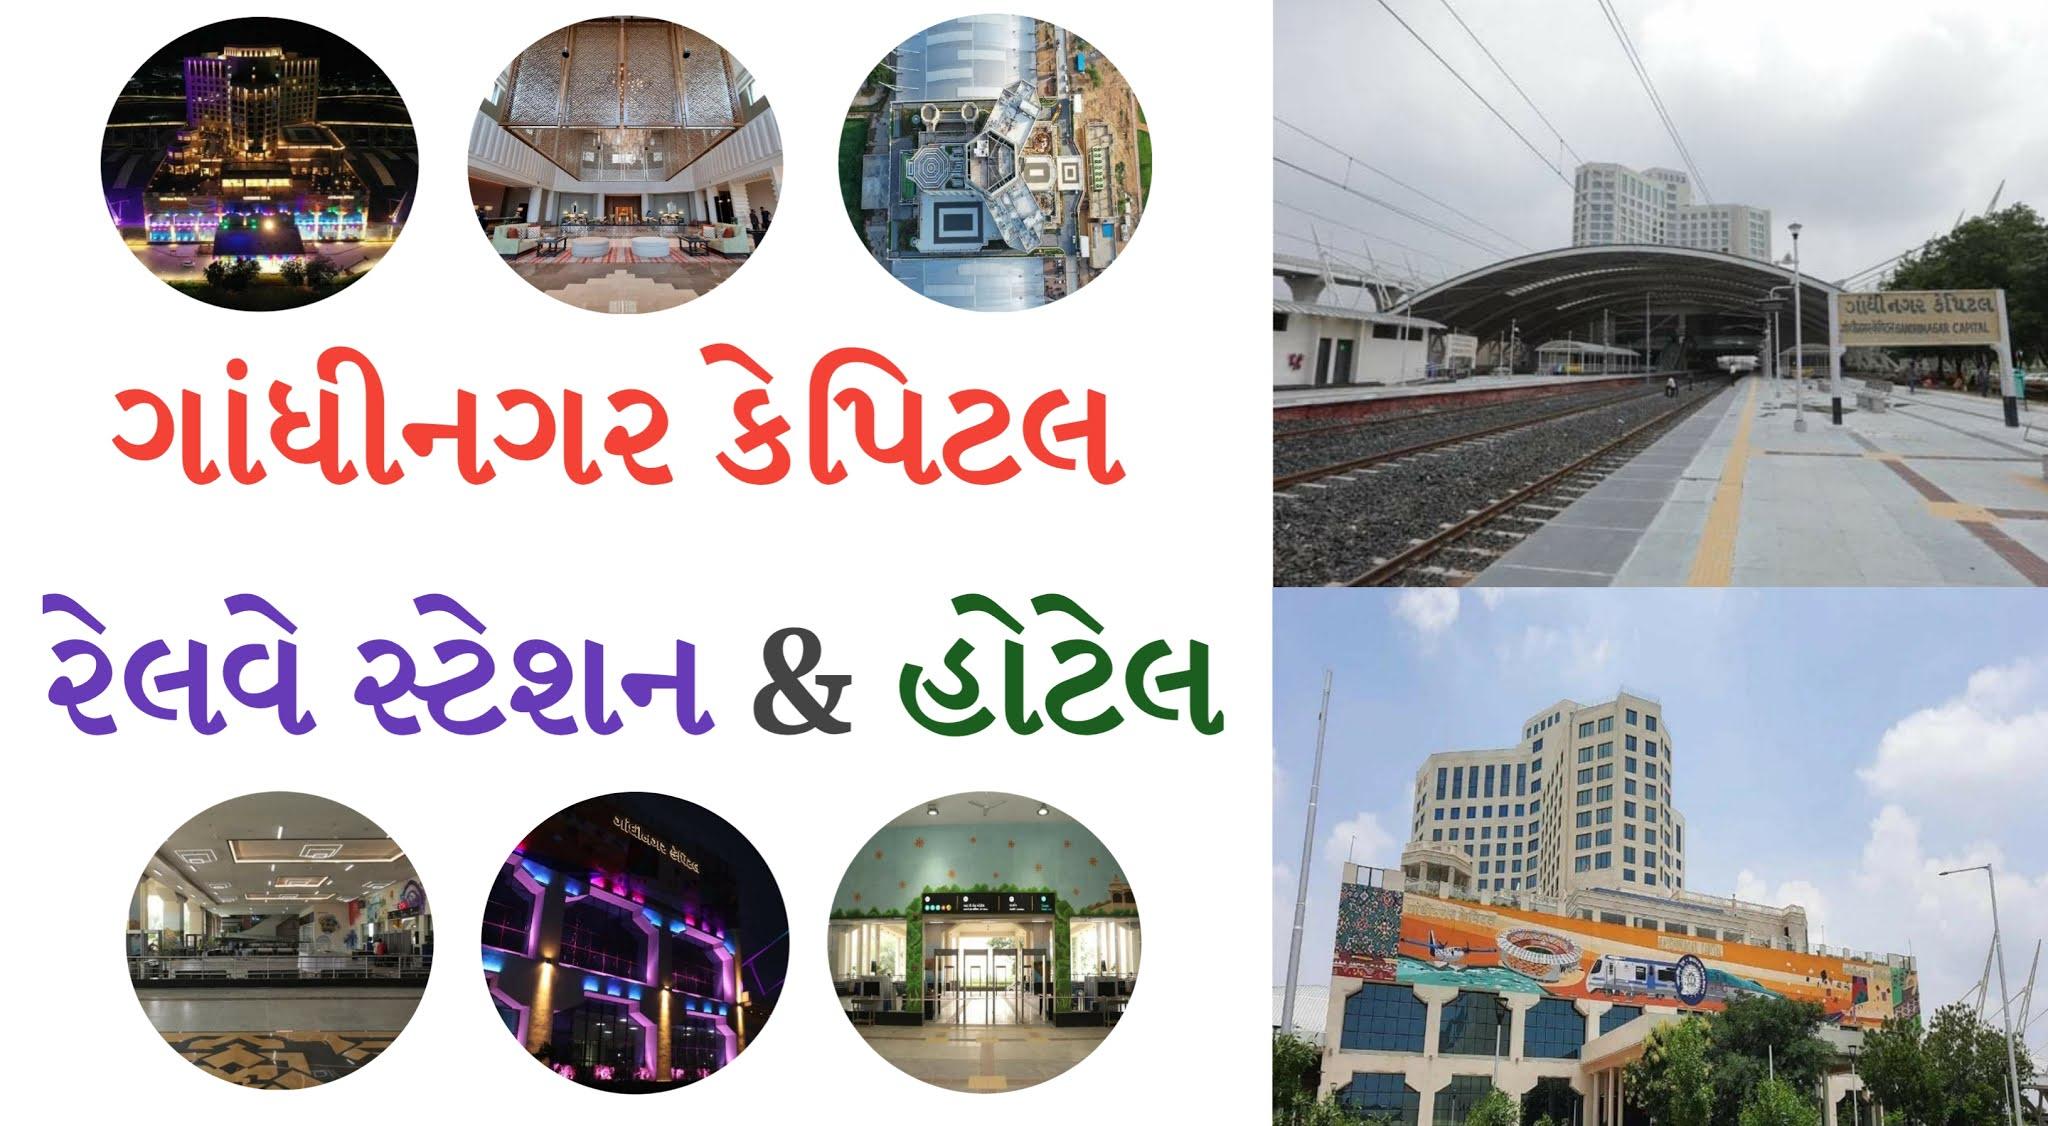 Gandhinagar Capital Railway Station & Hotel | ગાંધીનગર કેપિટલ રેલવે સ્ટેશન અને હોટલ